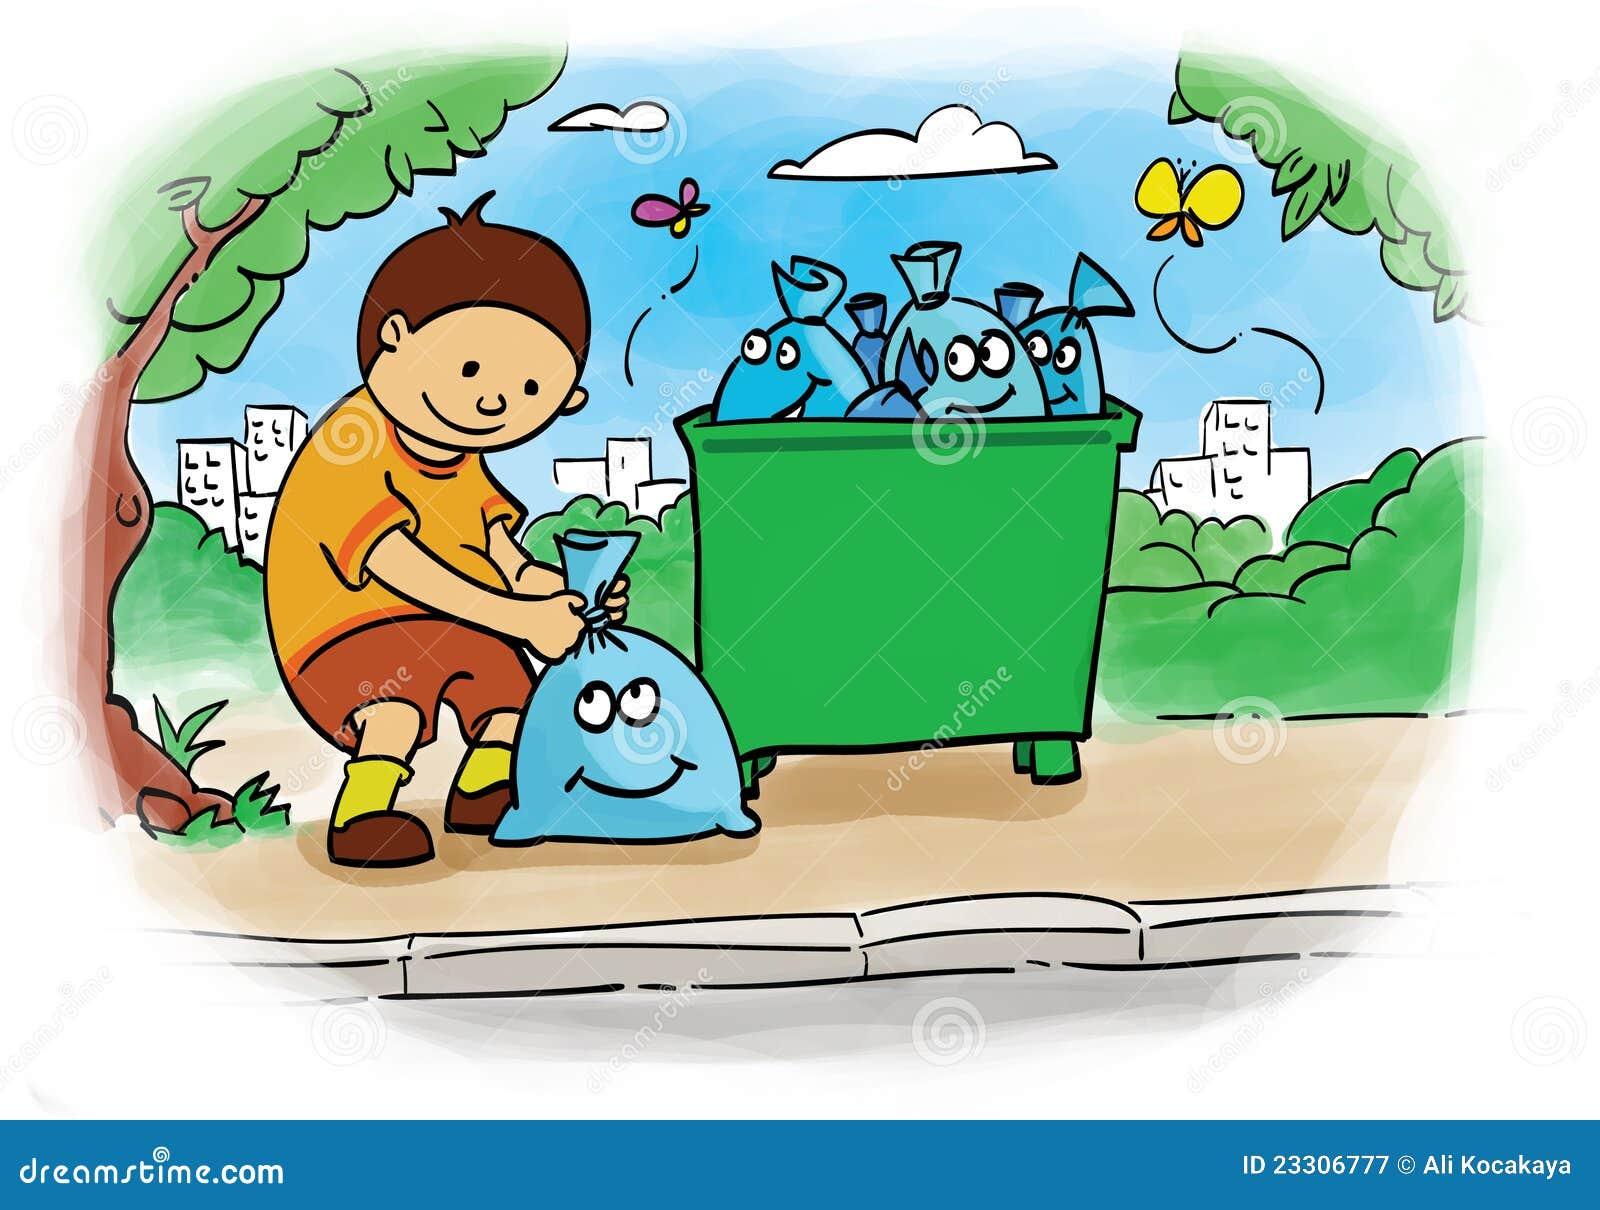 cartoon stock clipart environment - photo #12